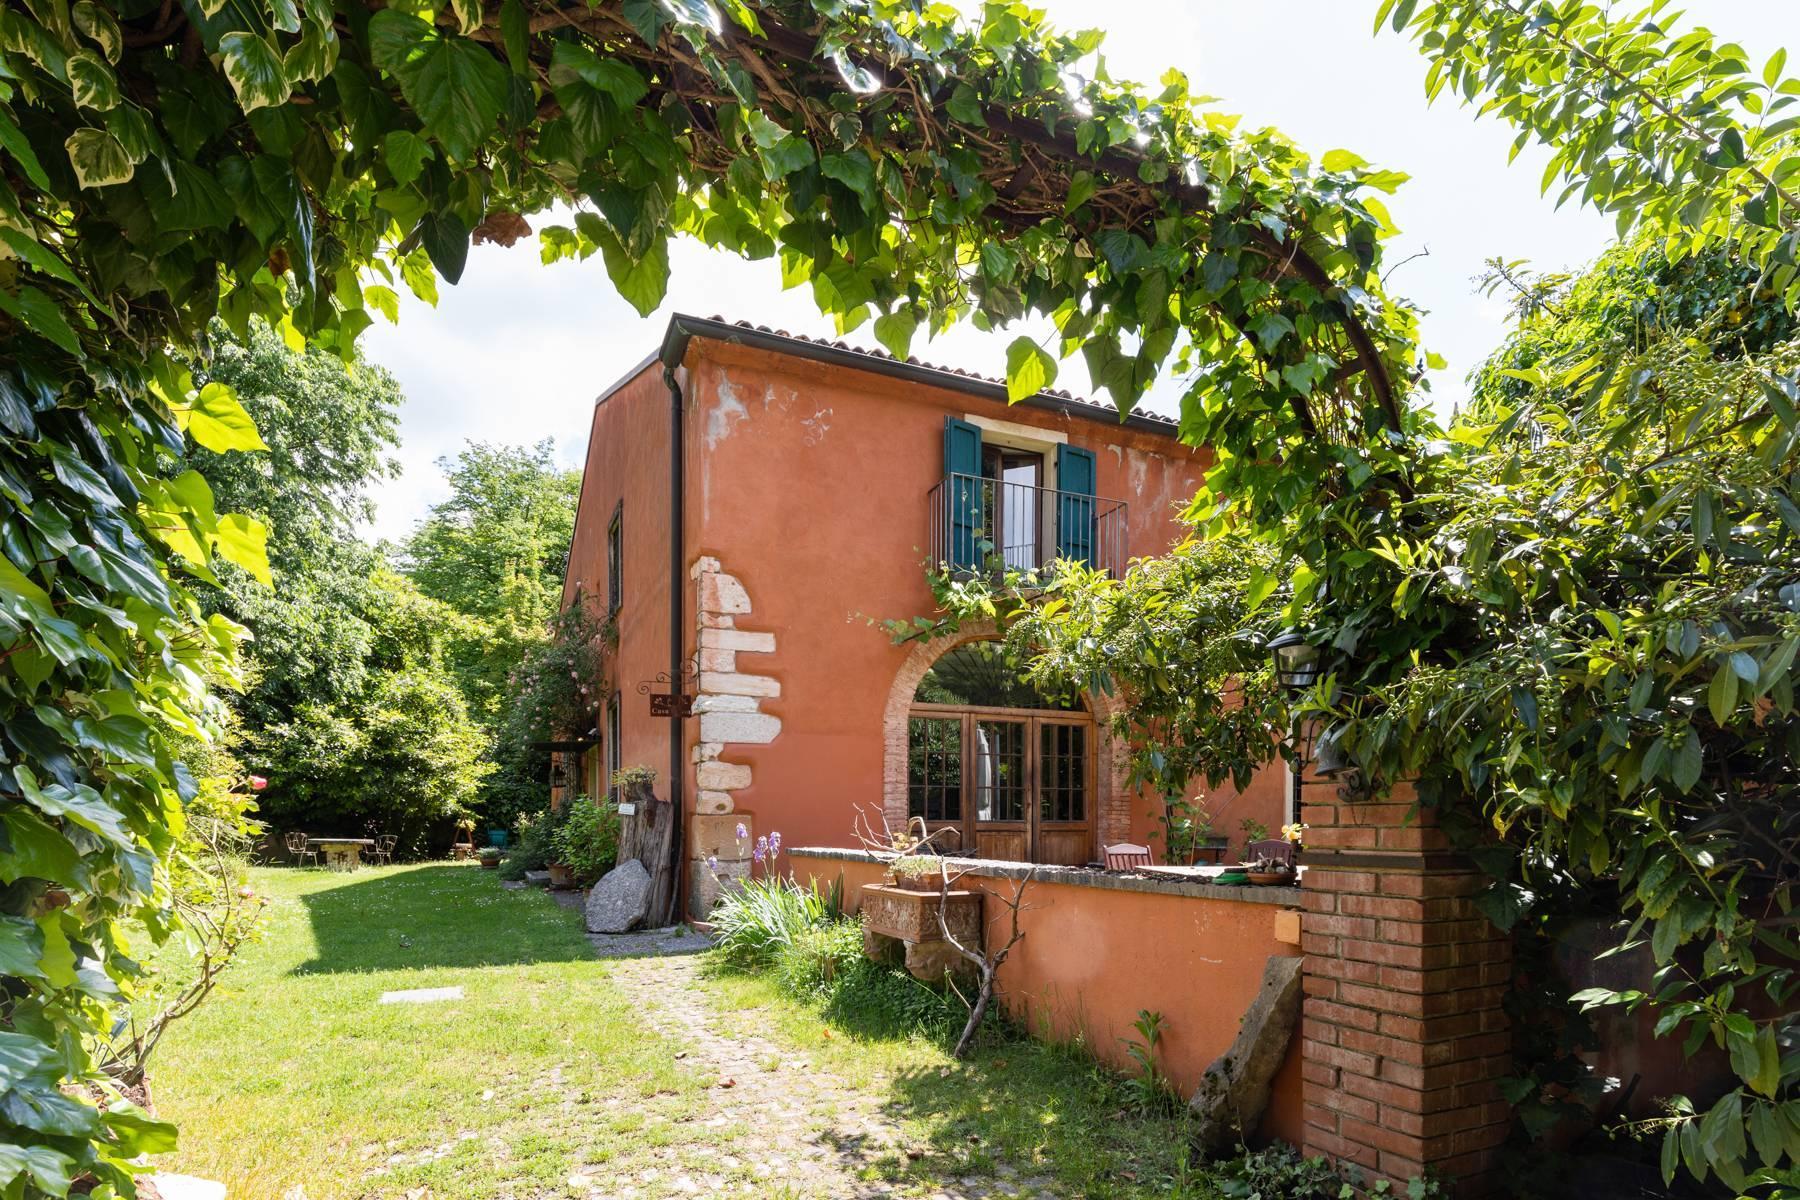 Affascinante villa Veneta a pochi minuti da Verona - 46